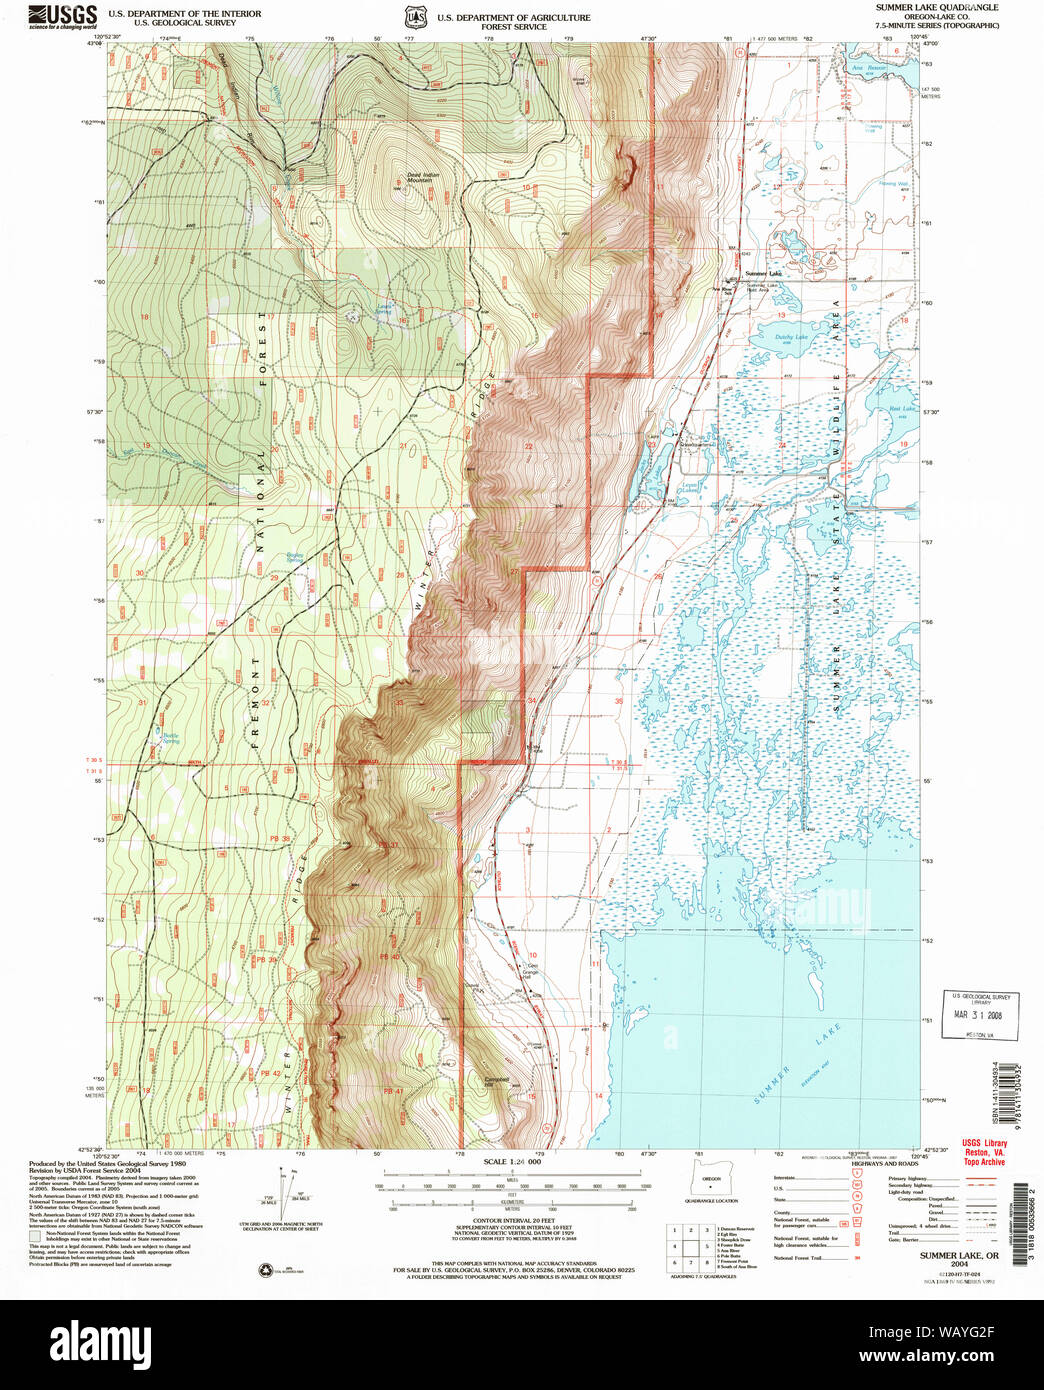 summer lake oregon map Usgs Topo Map Oregon Summer Lake 281687 2004 24000 Restoration